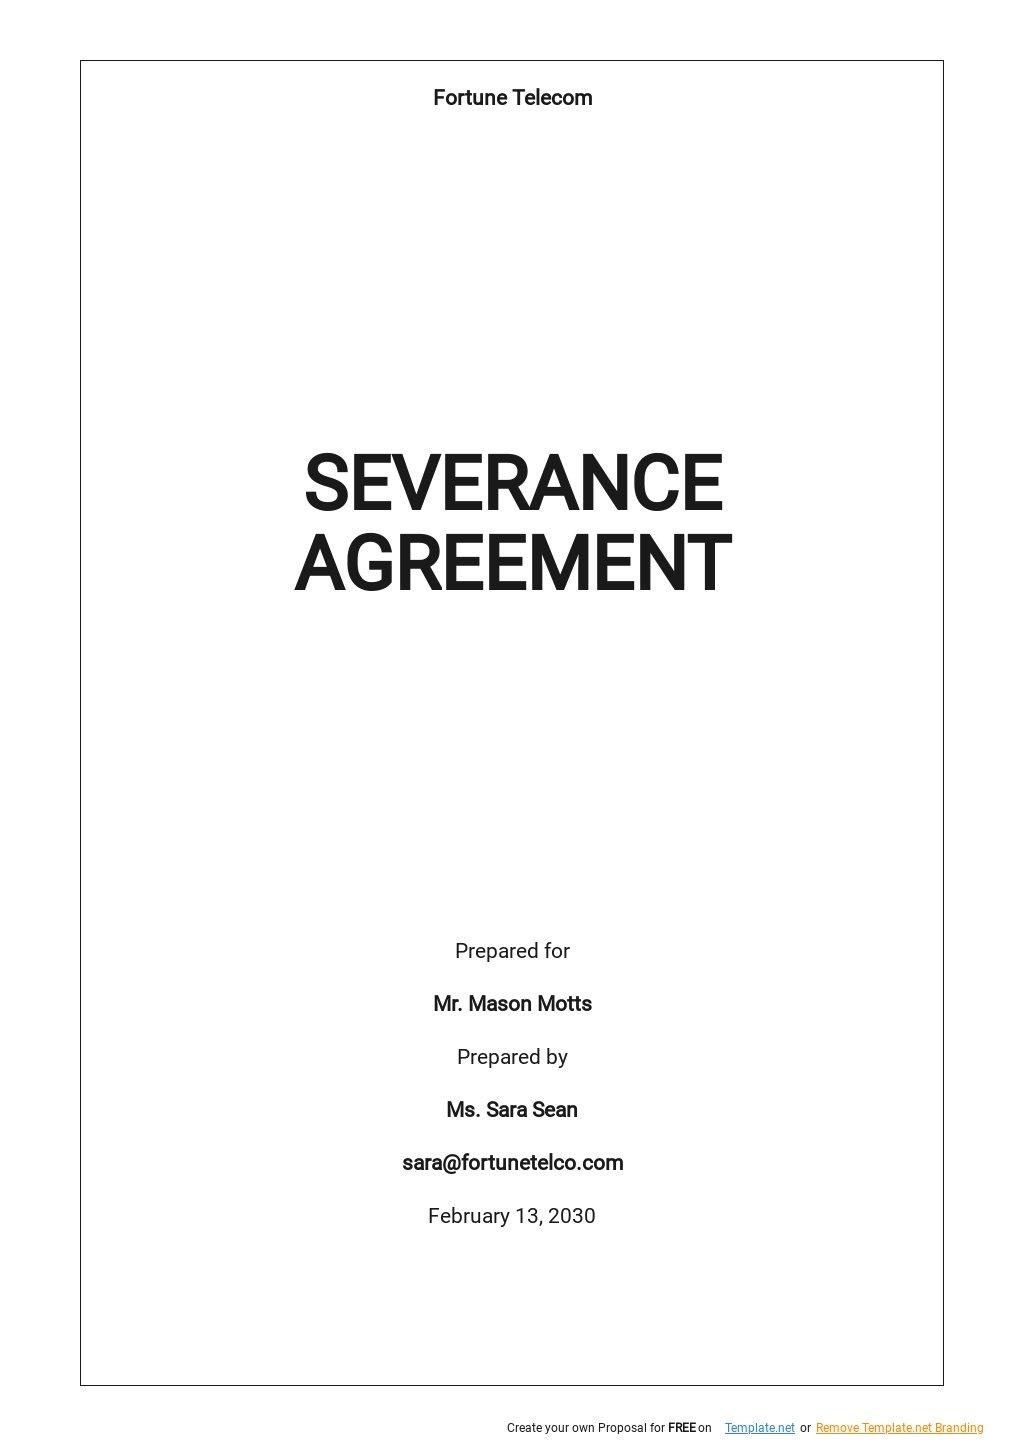 Severance Agreement Template.jpe